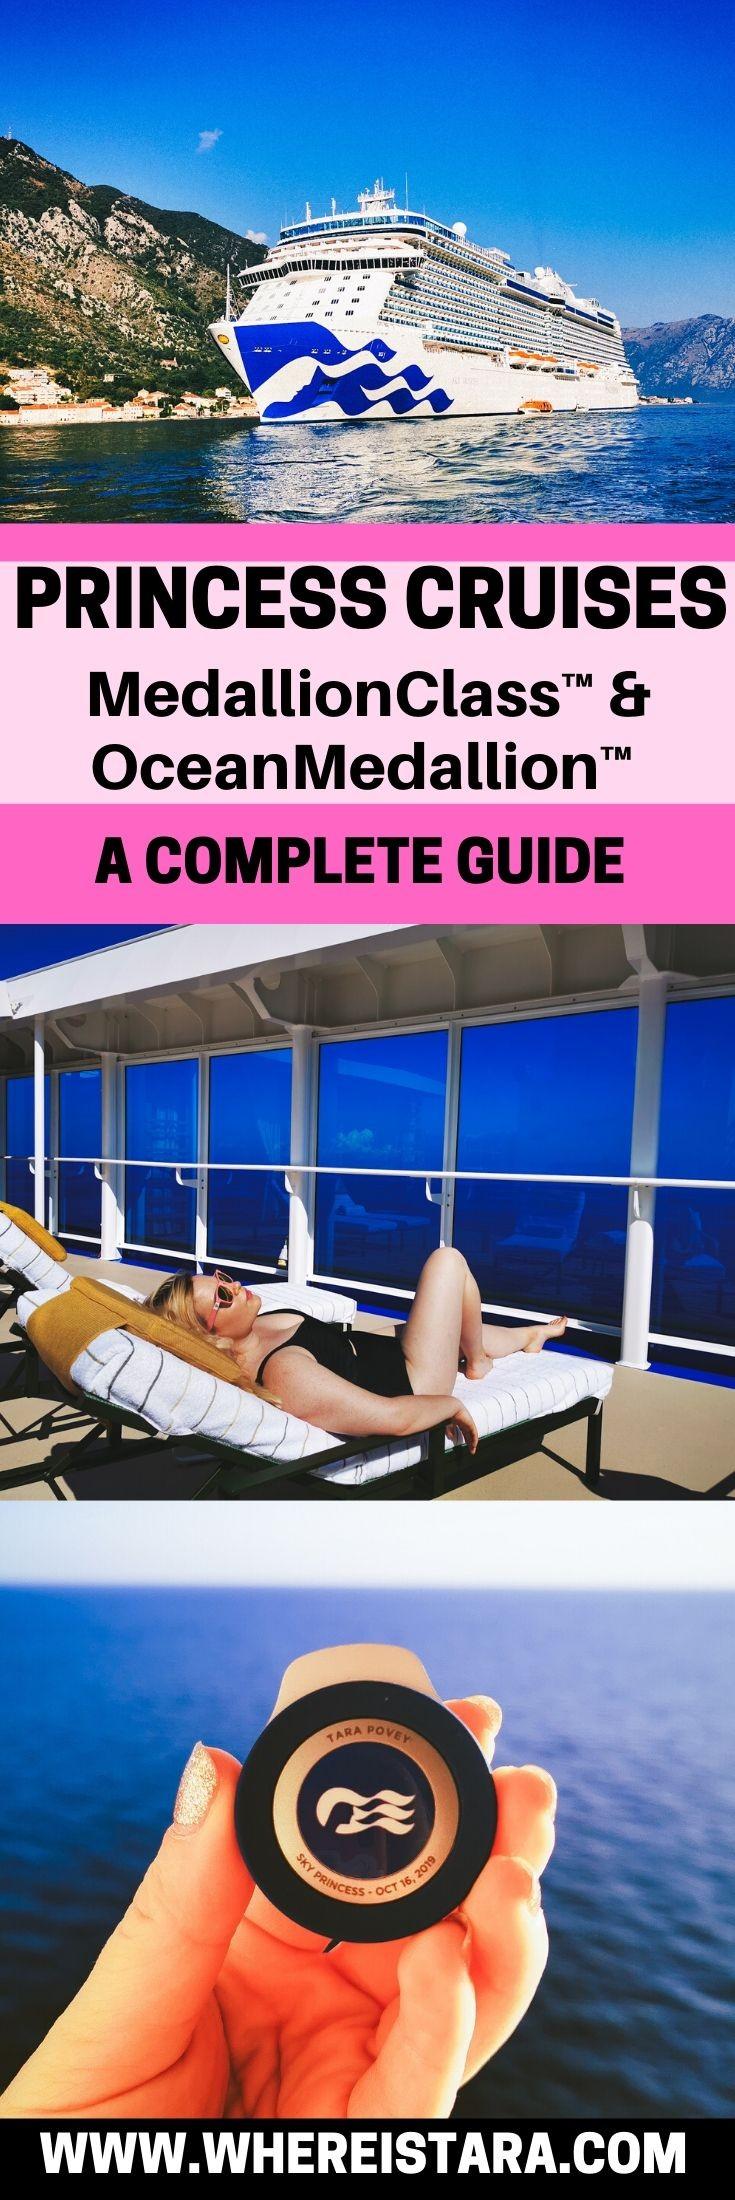 medallionclass sky princess oceanmedallion princess cruises pin